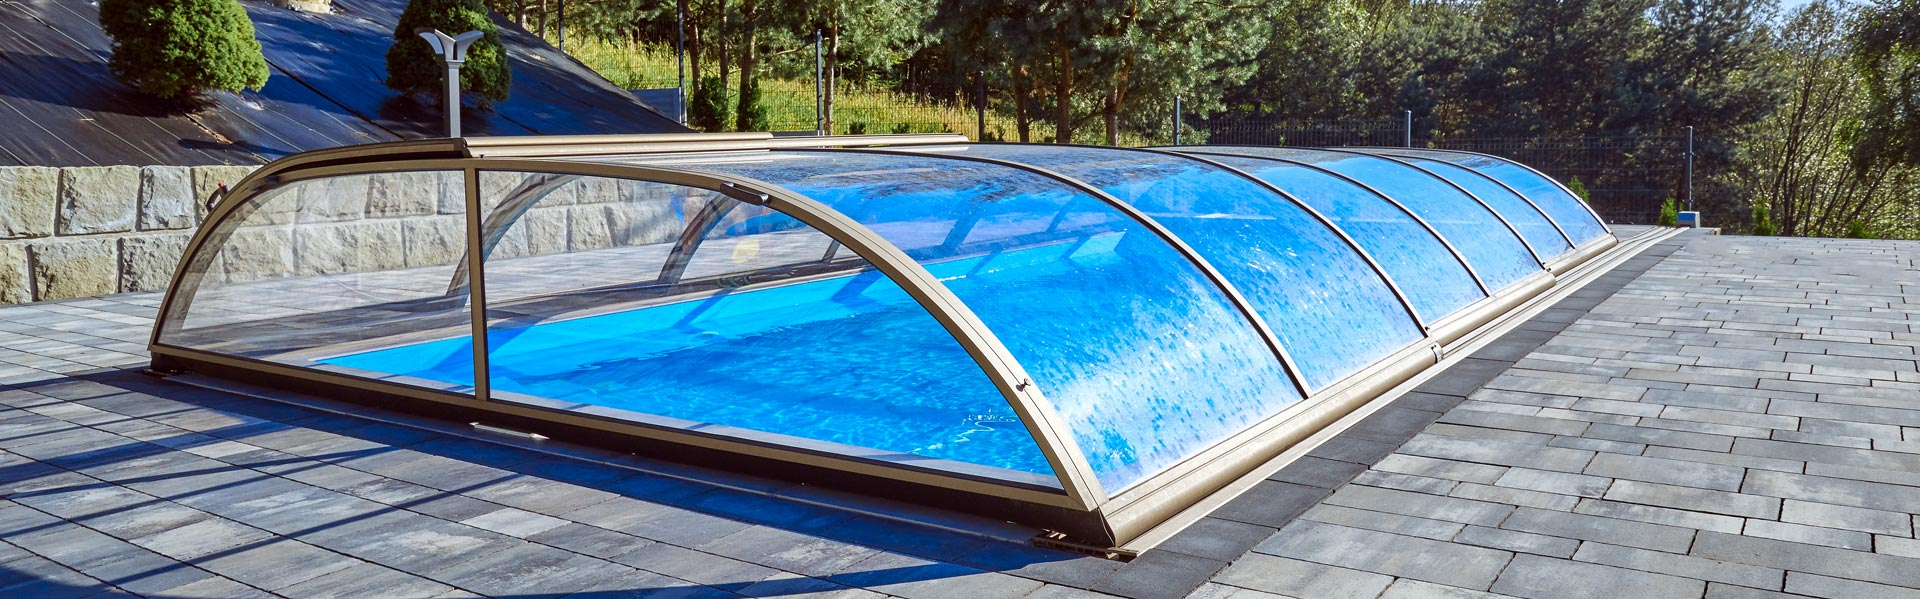 Symfonie | Pool Enclosures - Diamant Unipool s.r.o.